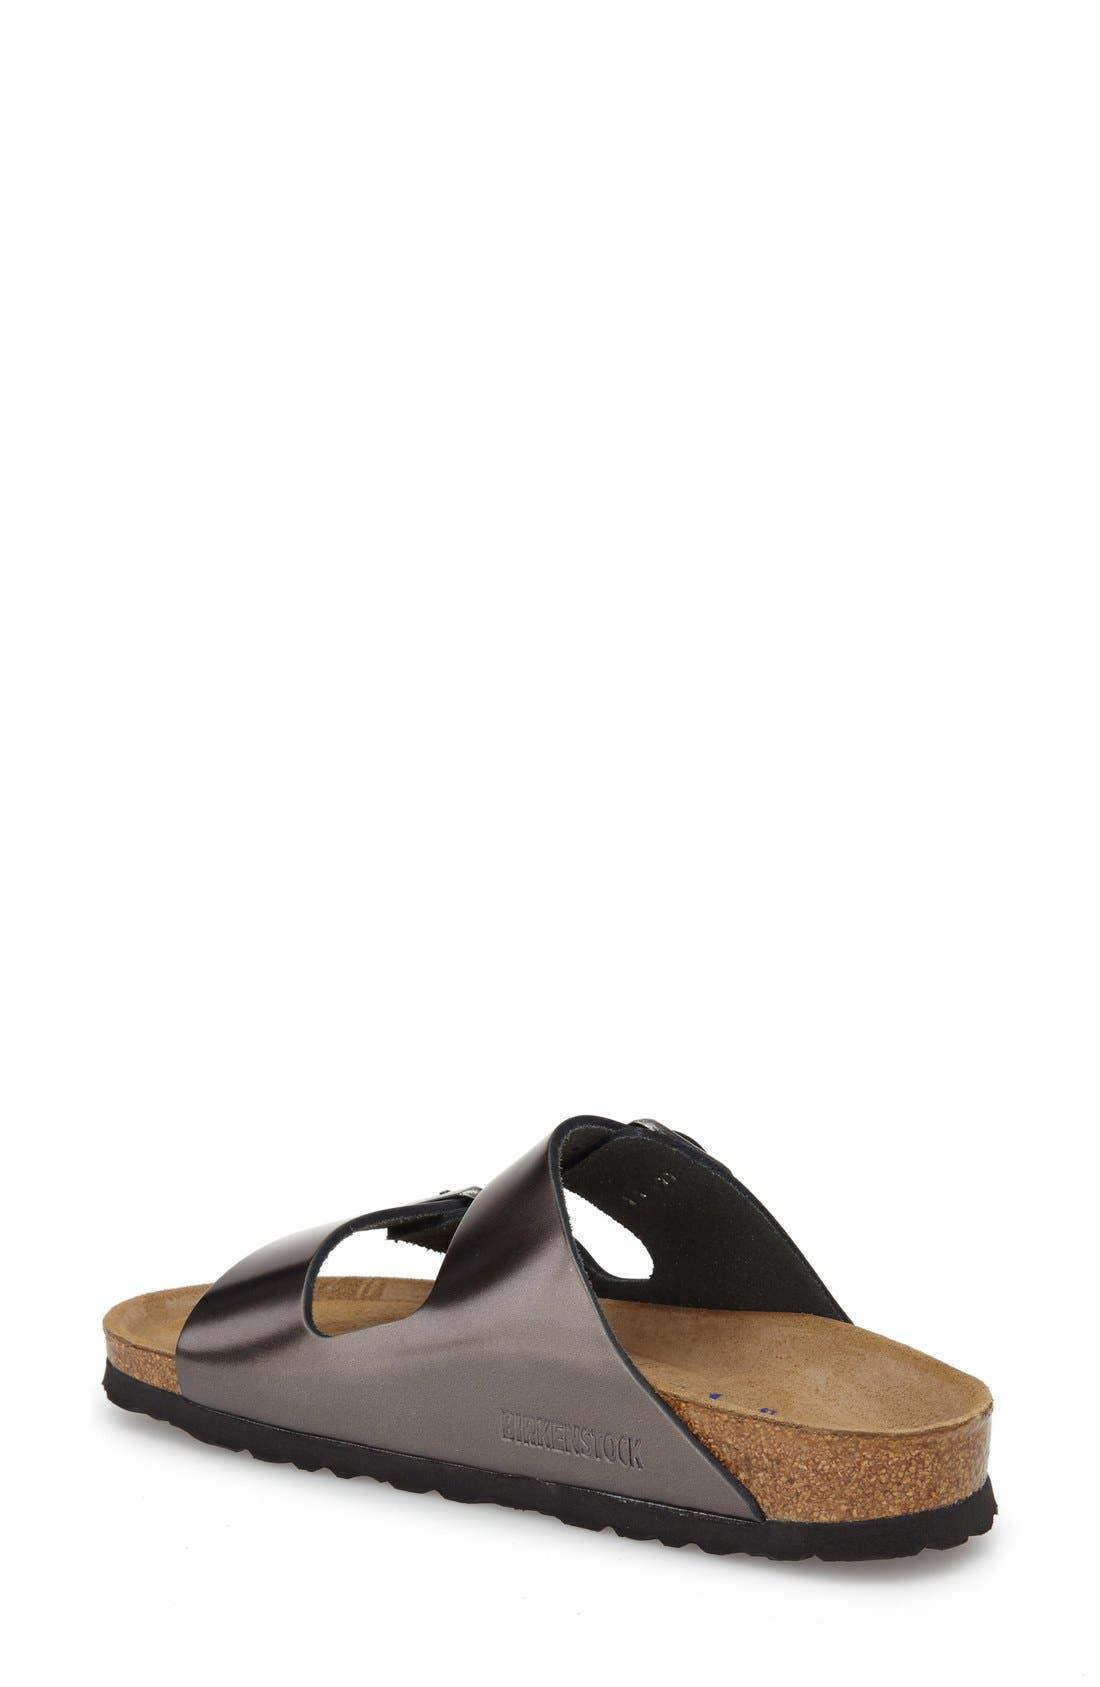 60f8a90df Women s Metallic Sandals